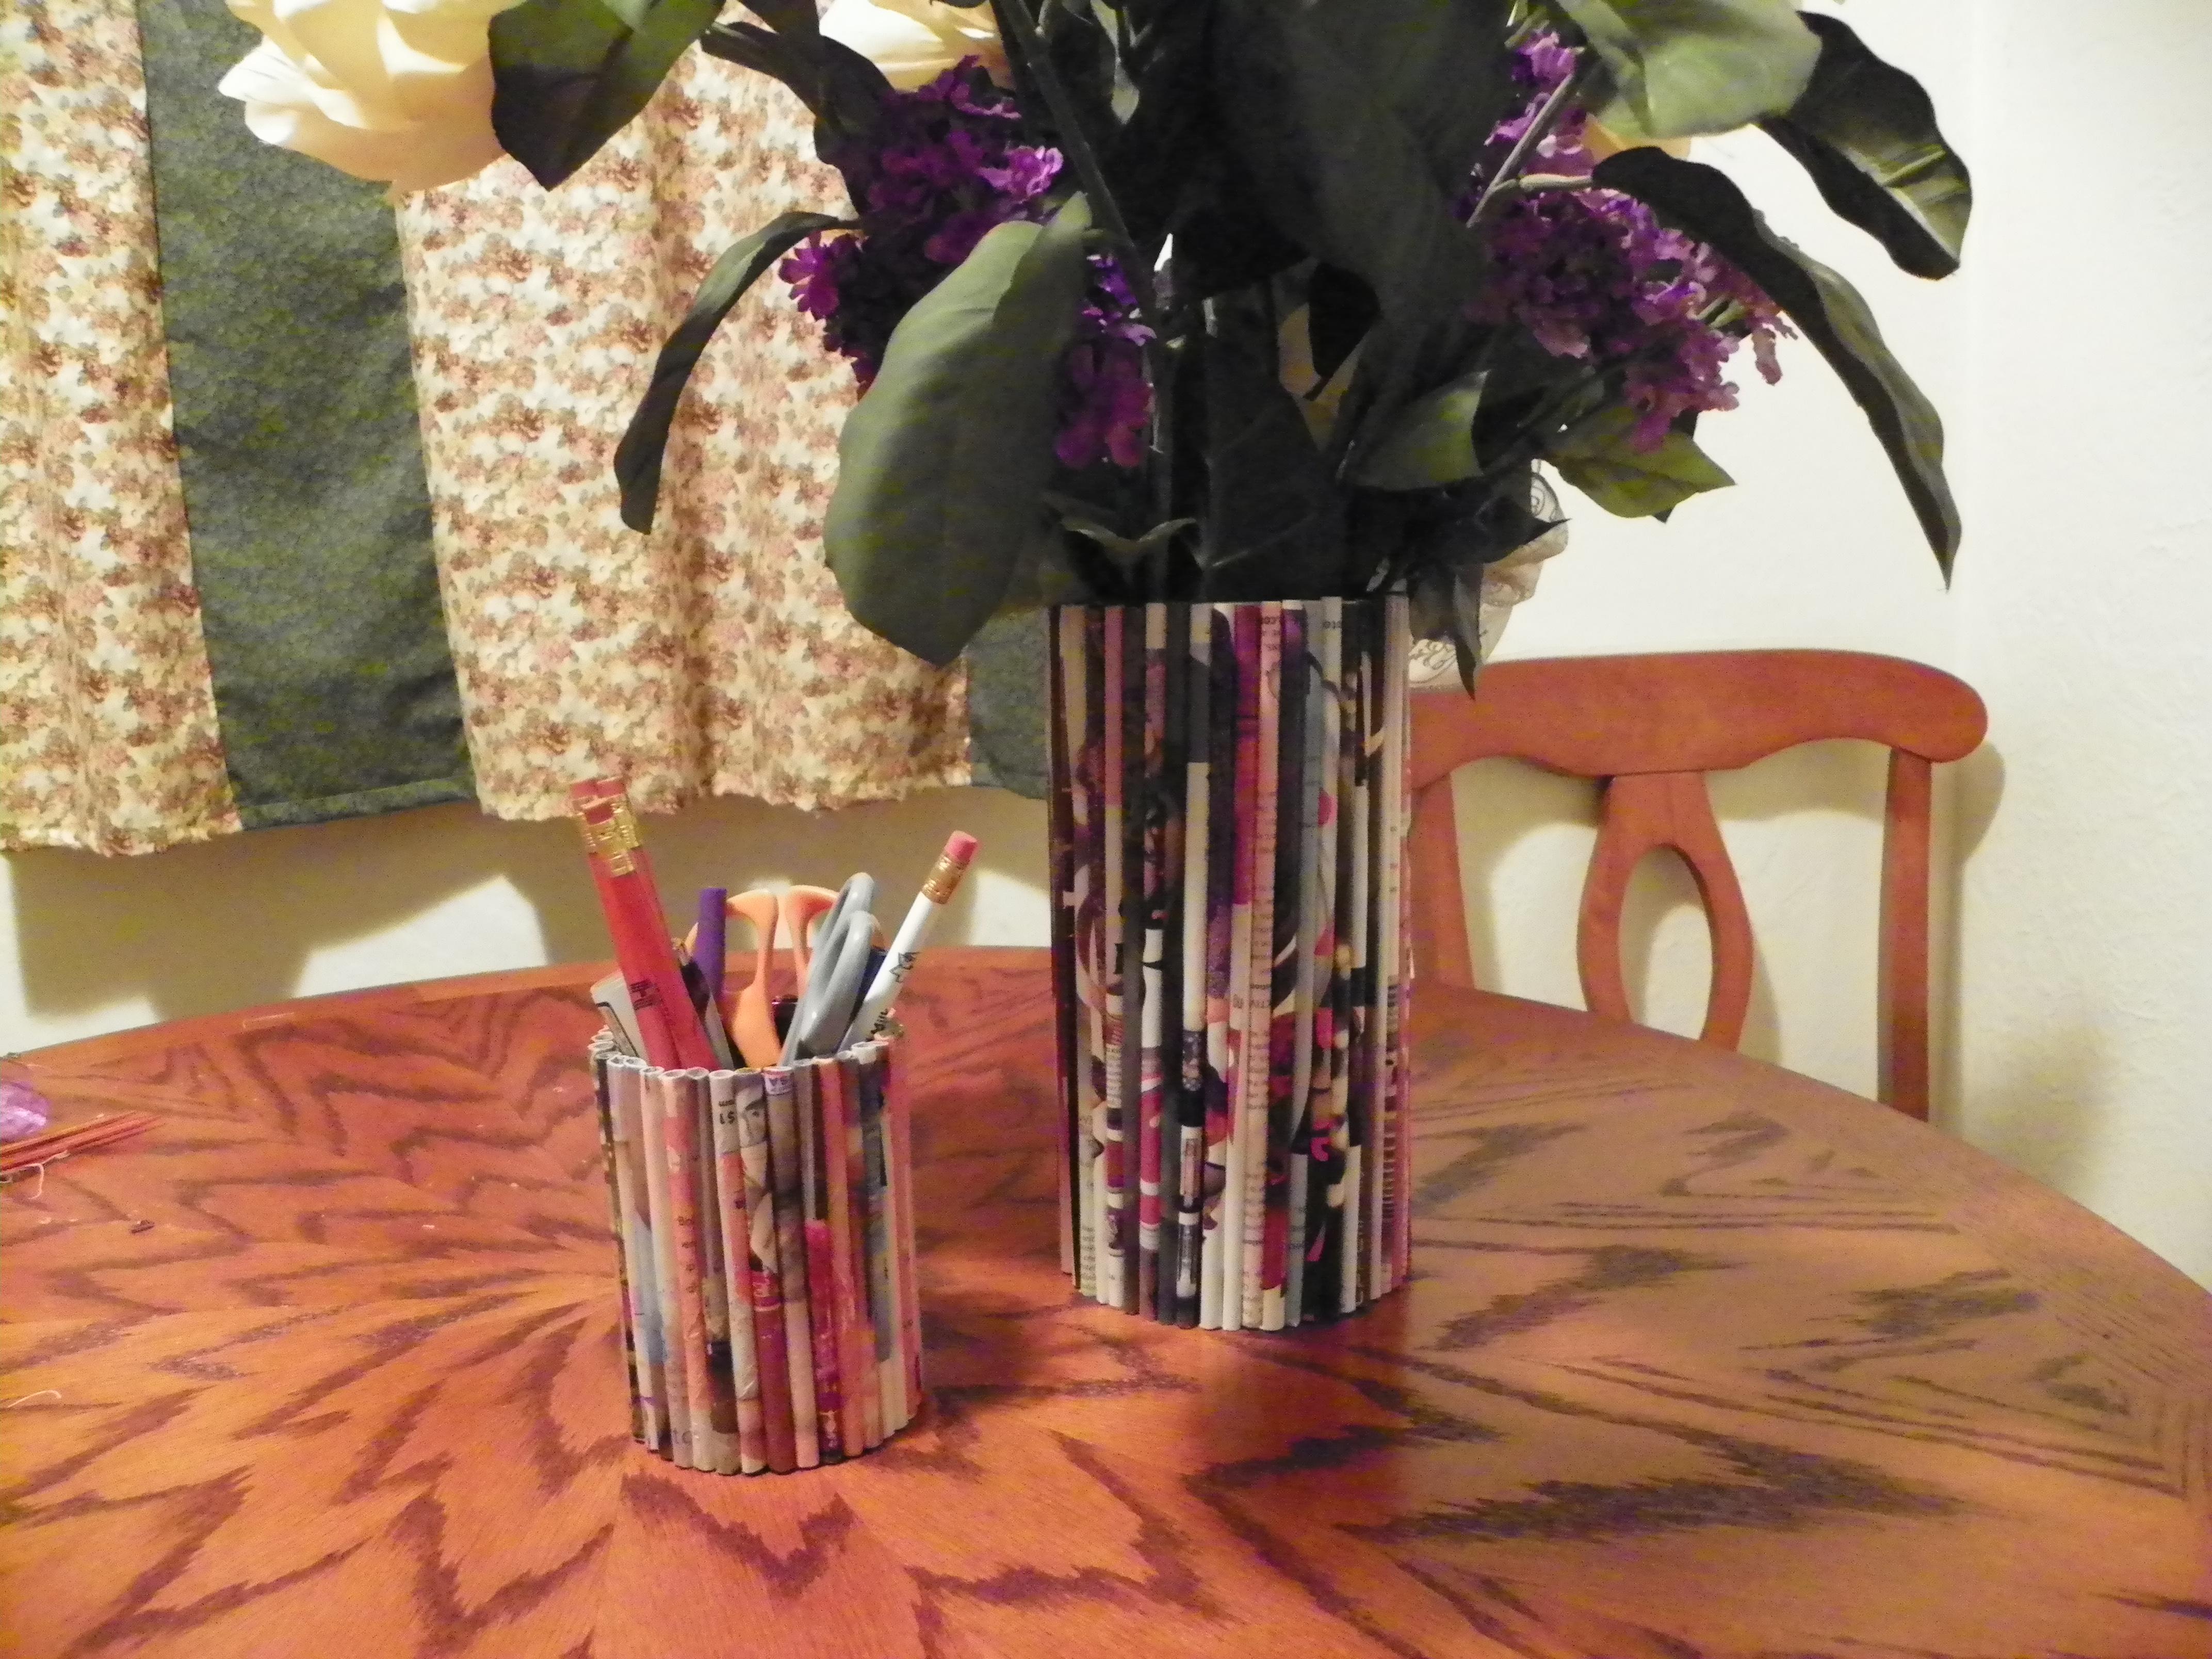 Magazine vase and pencil holder